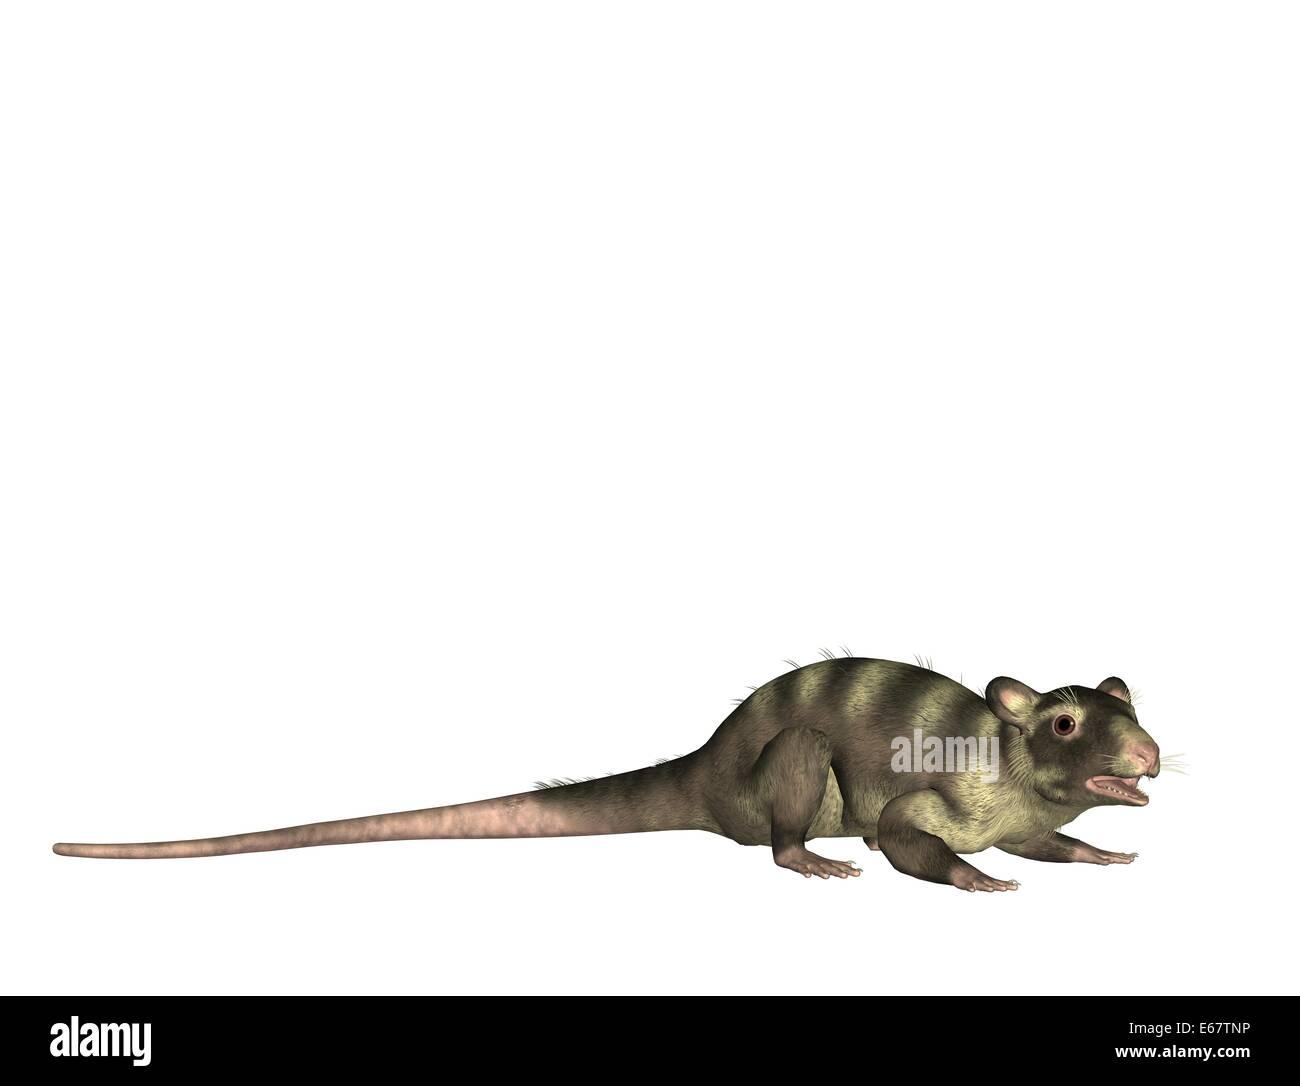 Pterodactylus / Pterodactylus Stock Photo